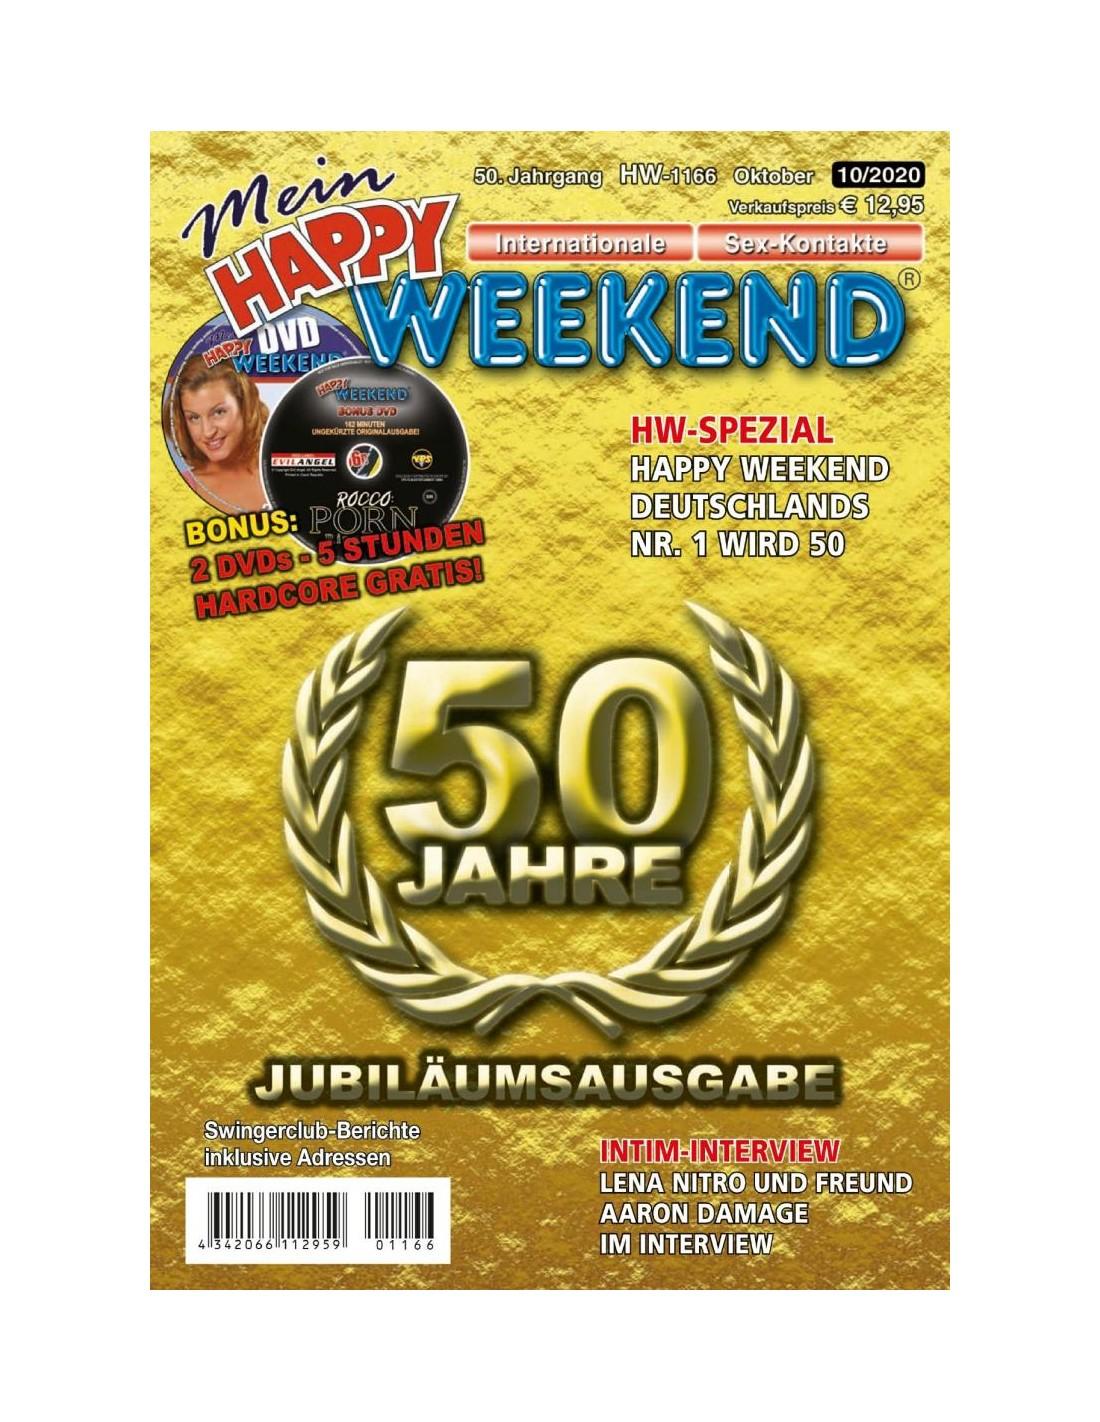 Happy Weekend Magazin 1166 (10/2020)